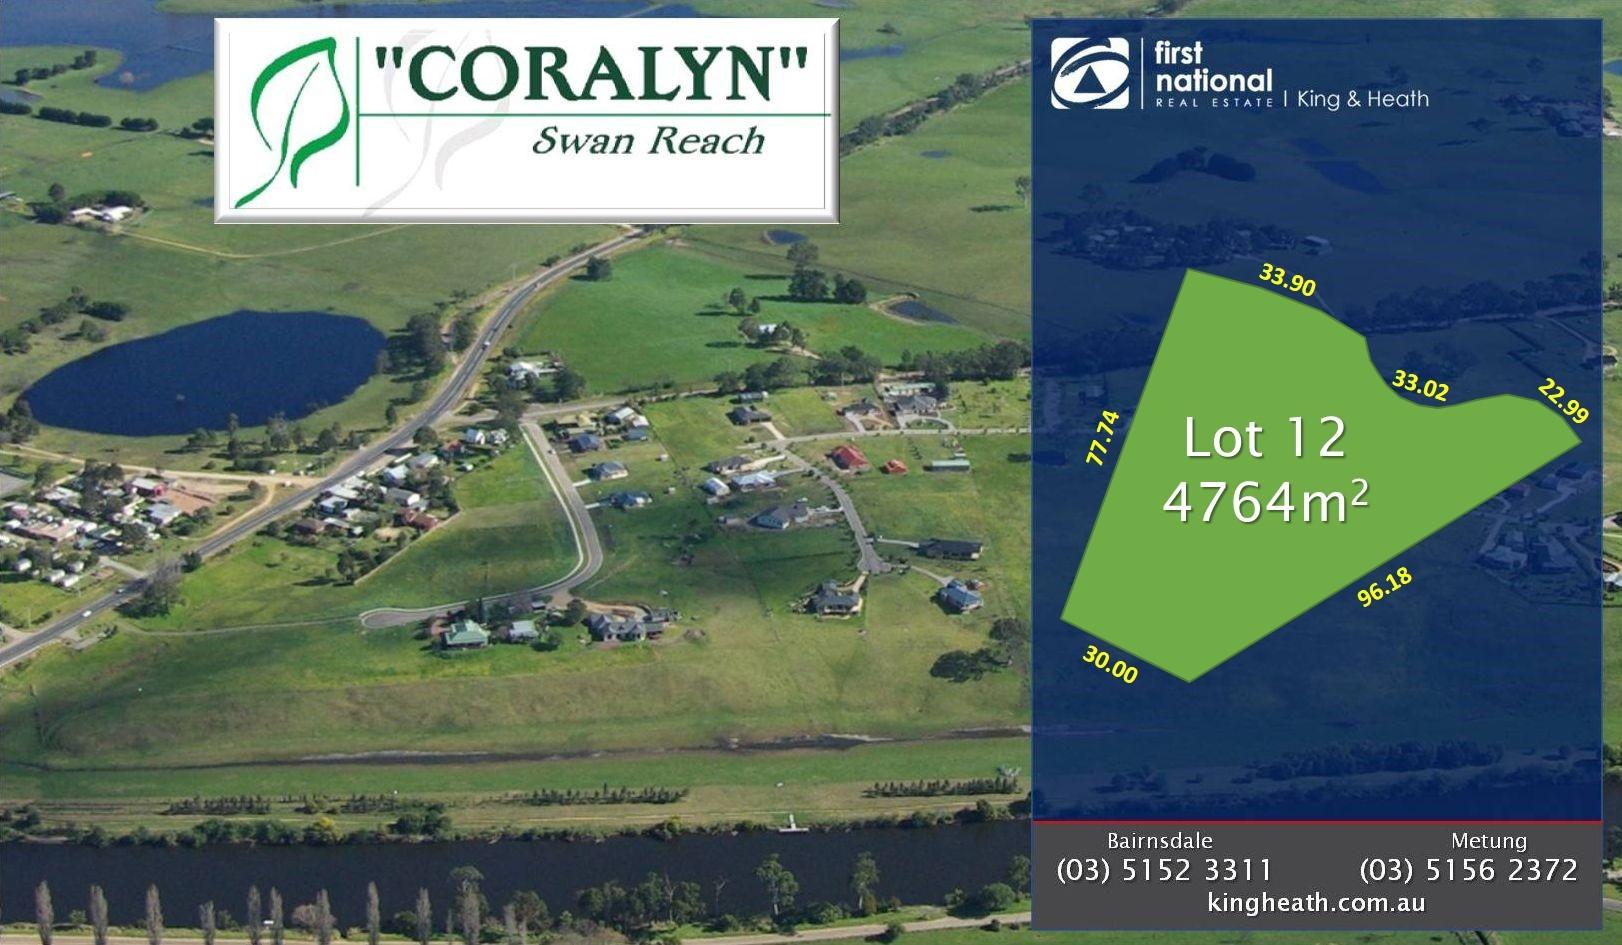 Lot 12 Coralyn Drive, Swan Reach VIC 3903-1